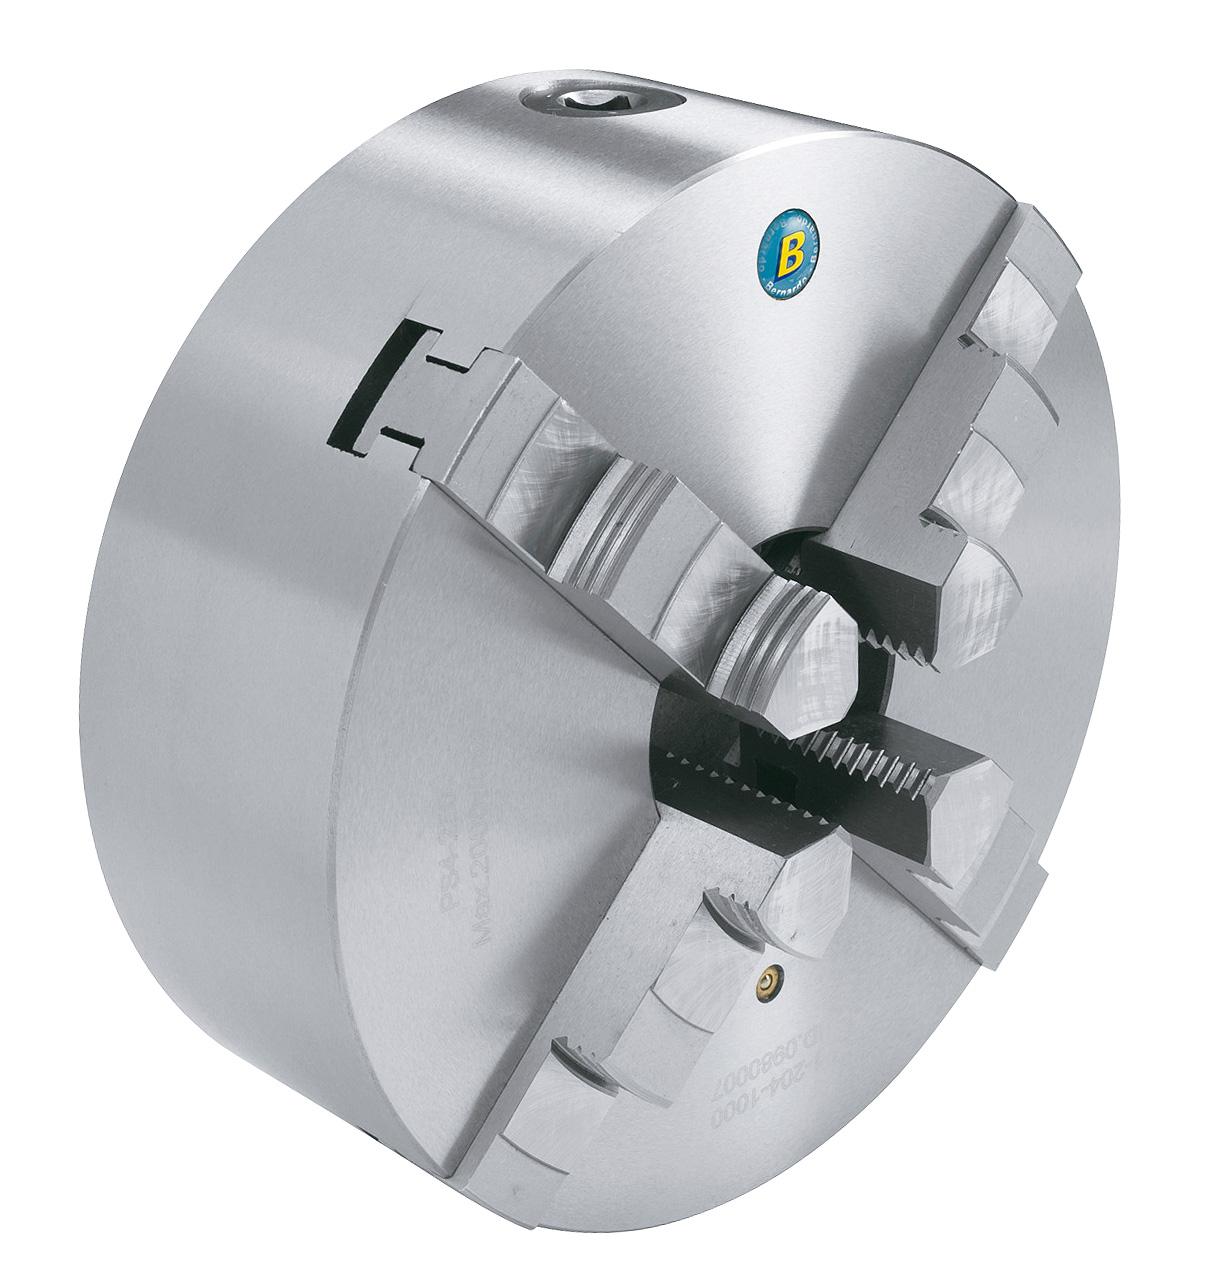 4 bakket centrerpatron standard DK12-500